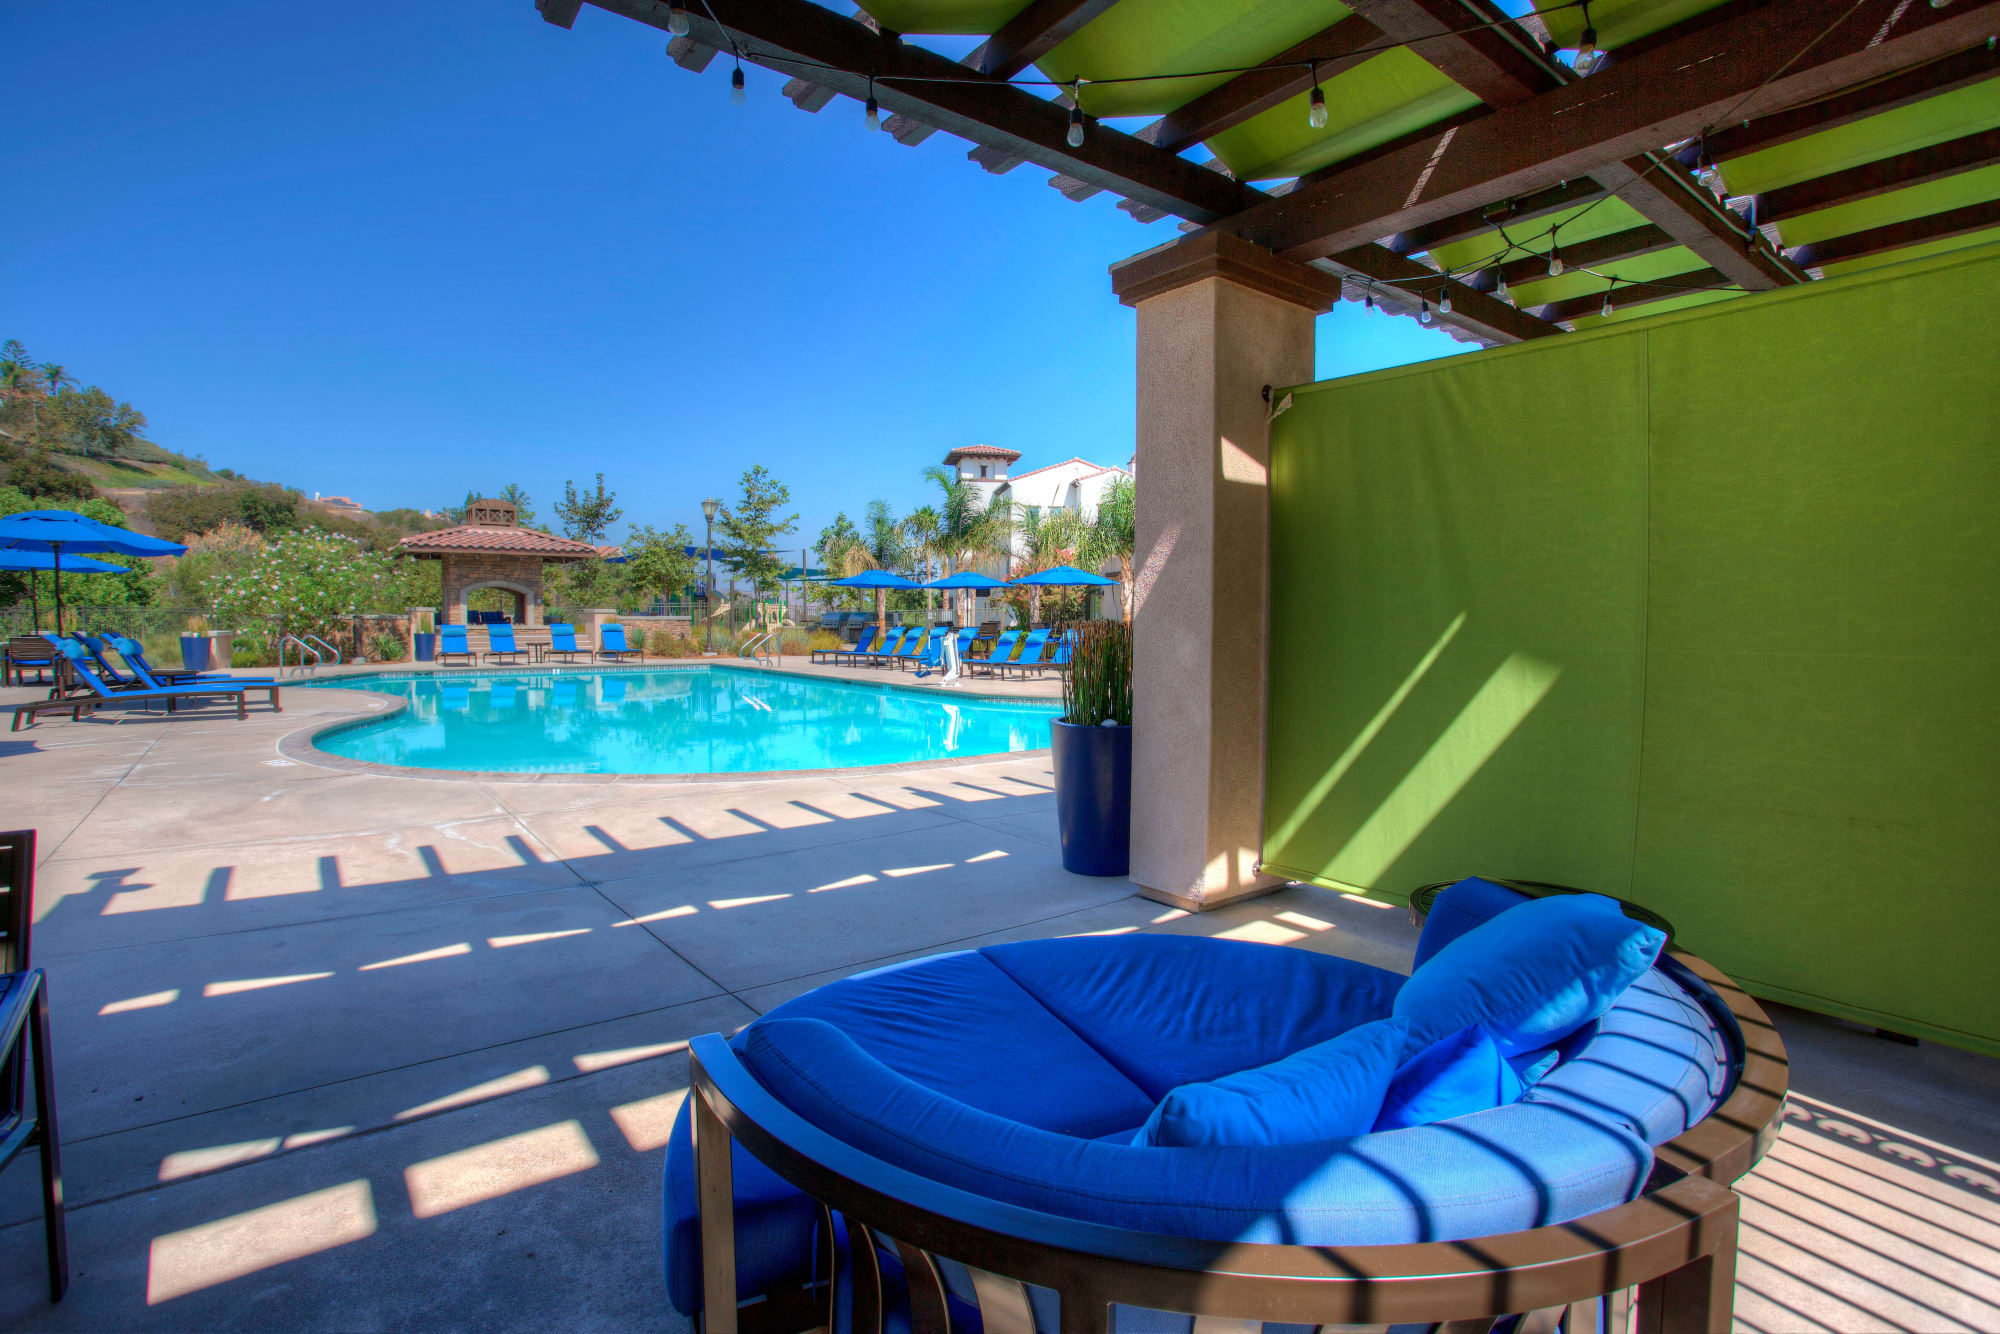 Poolside Cabanas at Palisades Sierra Del Oro